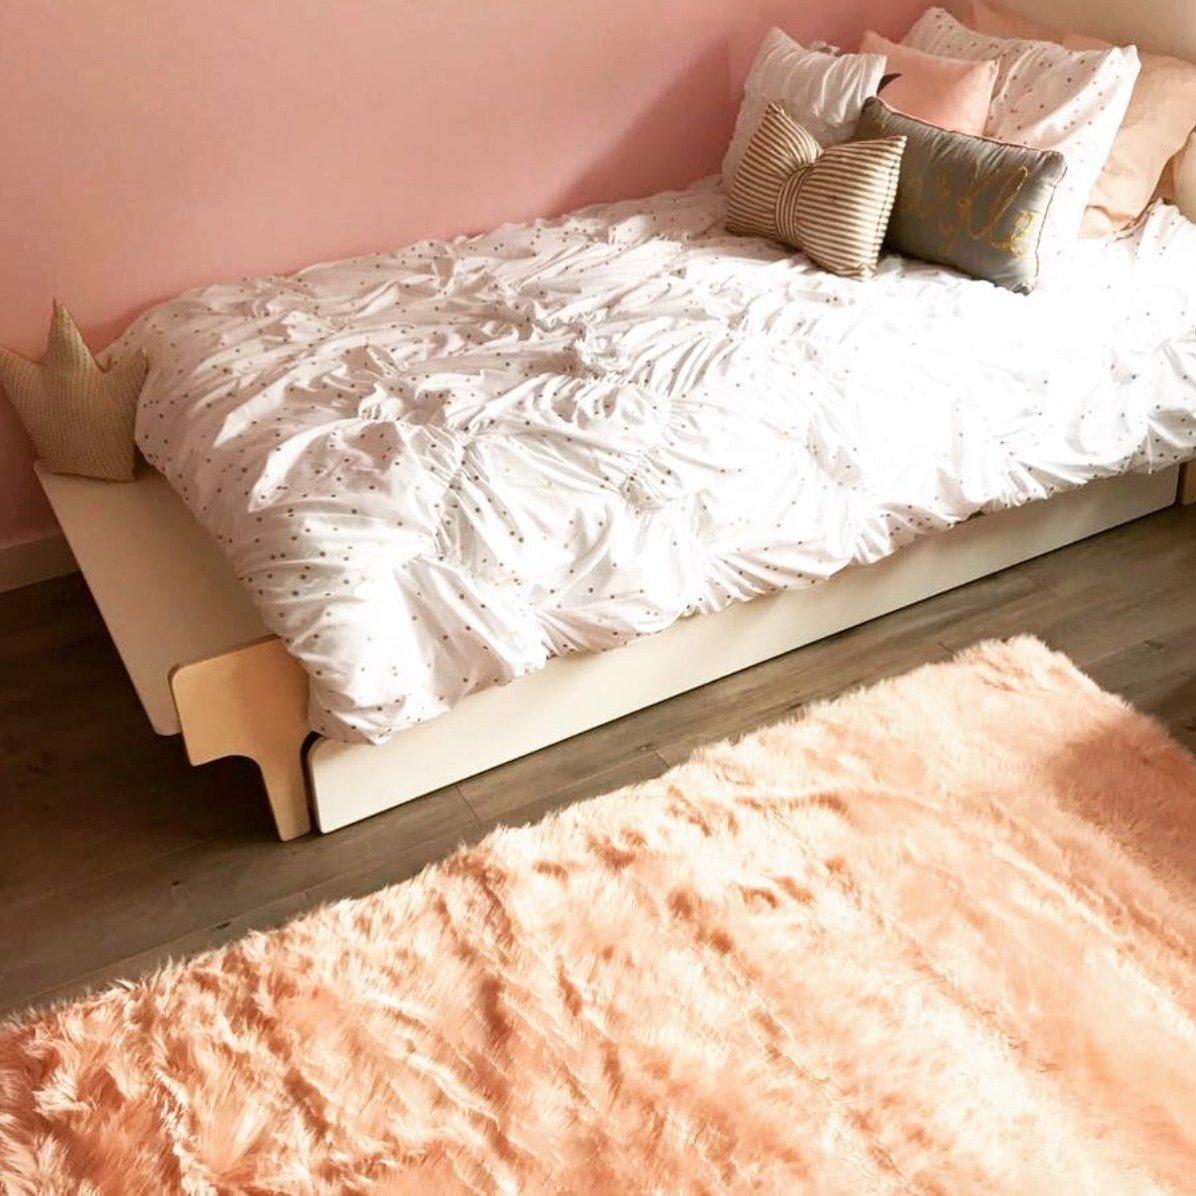 Machine Washable Faux Sheepskin Blush Rug 4' x 6' - Soft and silky - Perfect for baby's room, nursery, playroom (4' x 6' ft Blush/Peach)